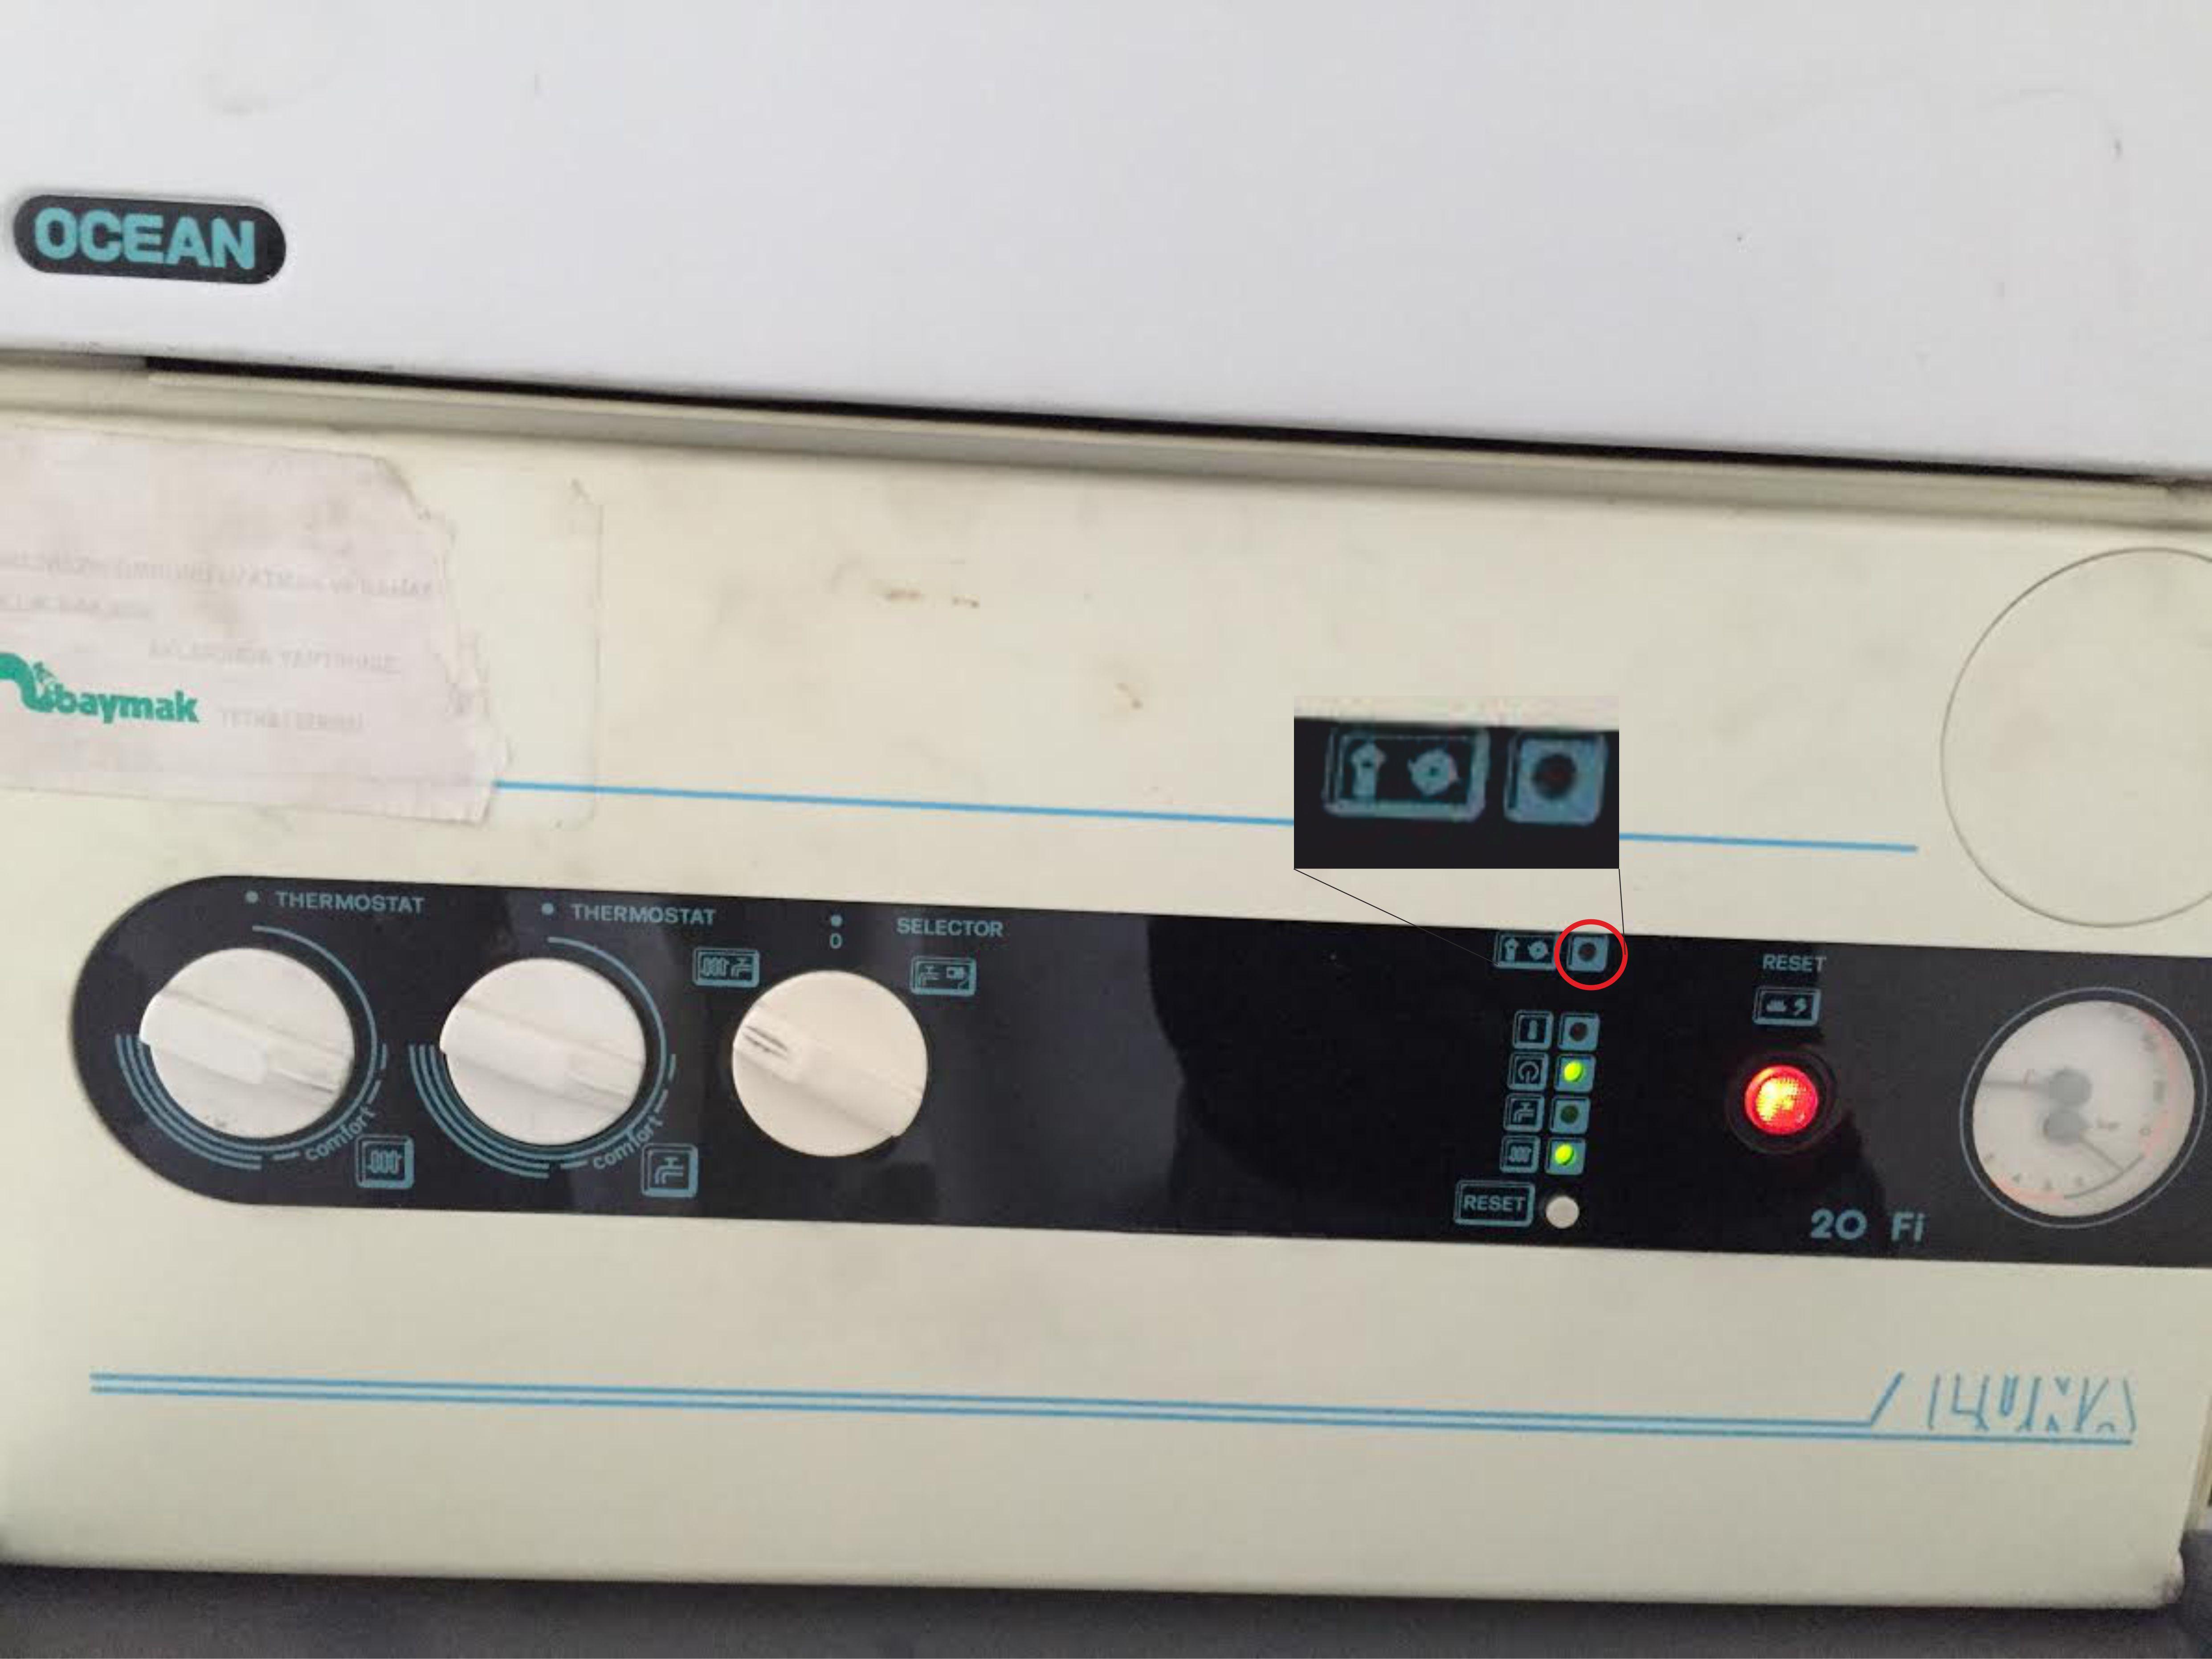 Cevap komb arizalari buraya for Manuale termostato luna in 20 fi